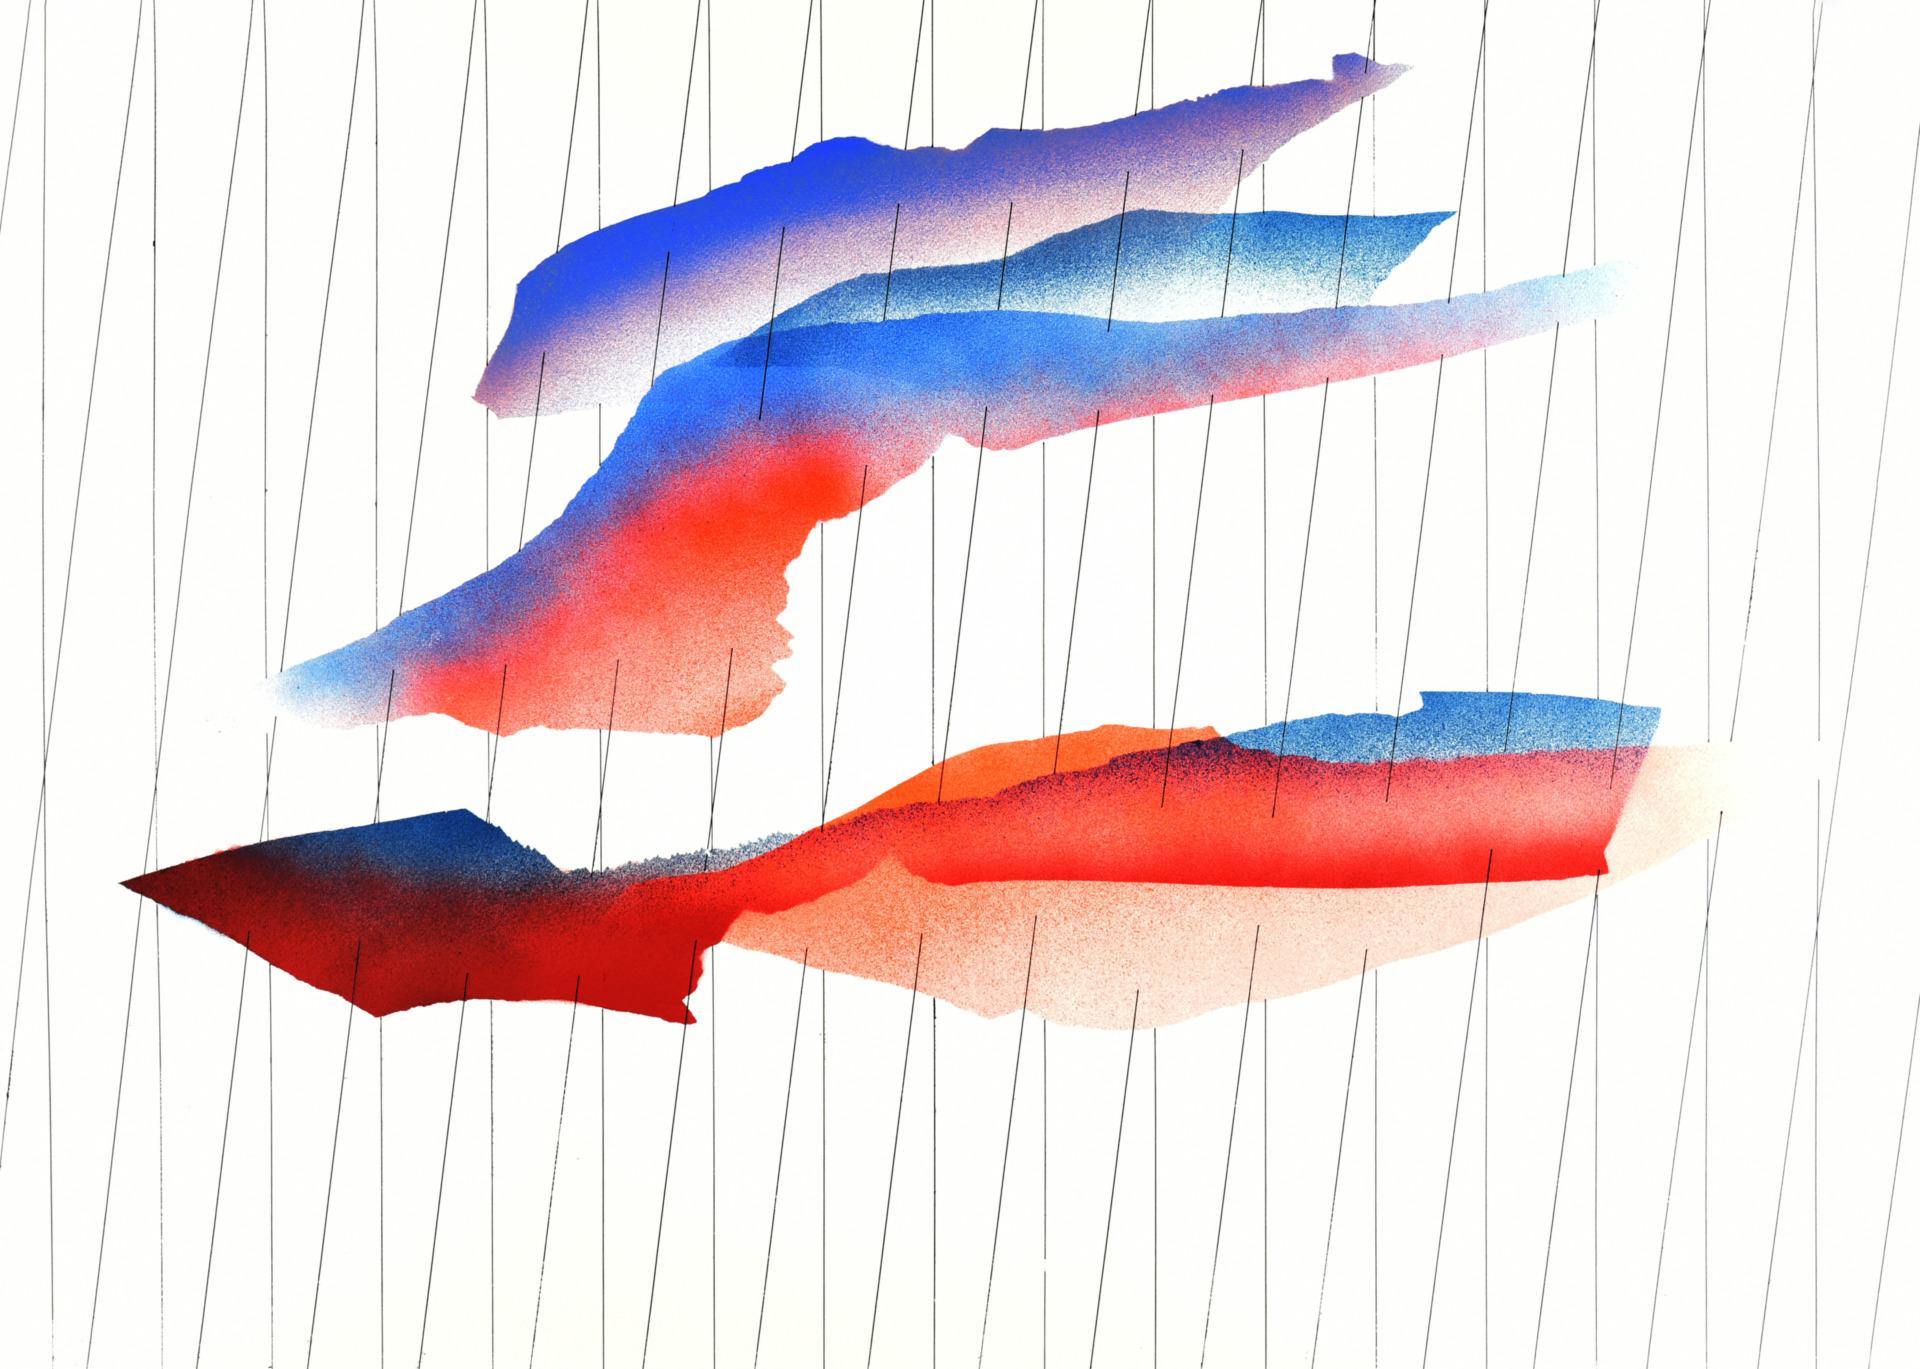 op061219 acrylic on paper, 105x75cm